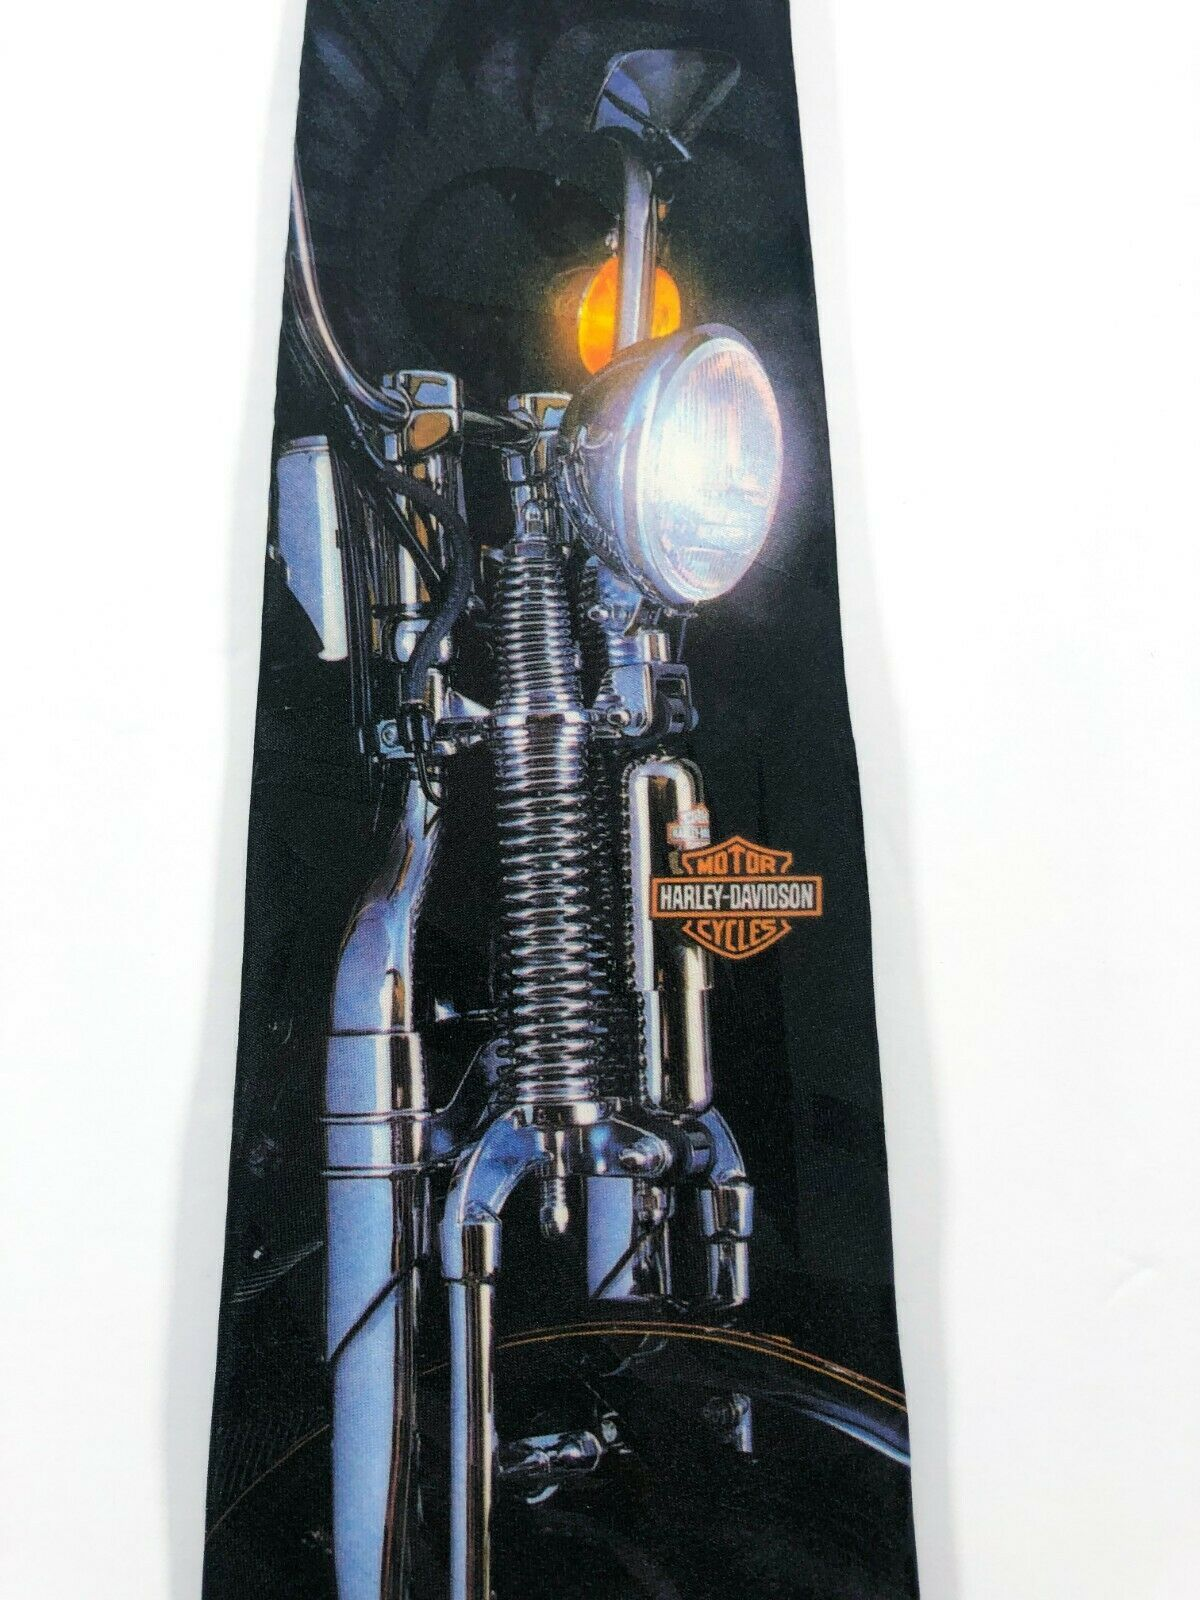 Harley Davidson Neck Tie Chrome Motorcycle The Leading Edge Ralph Marlin